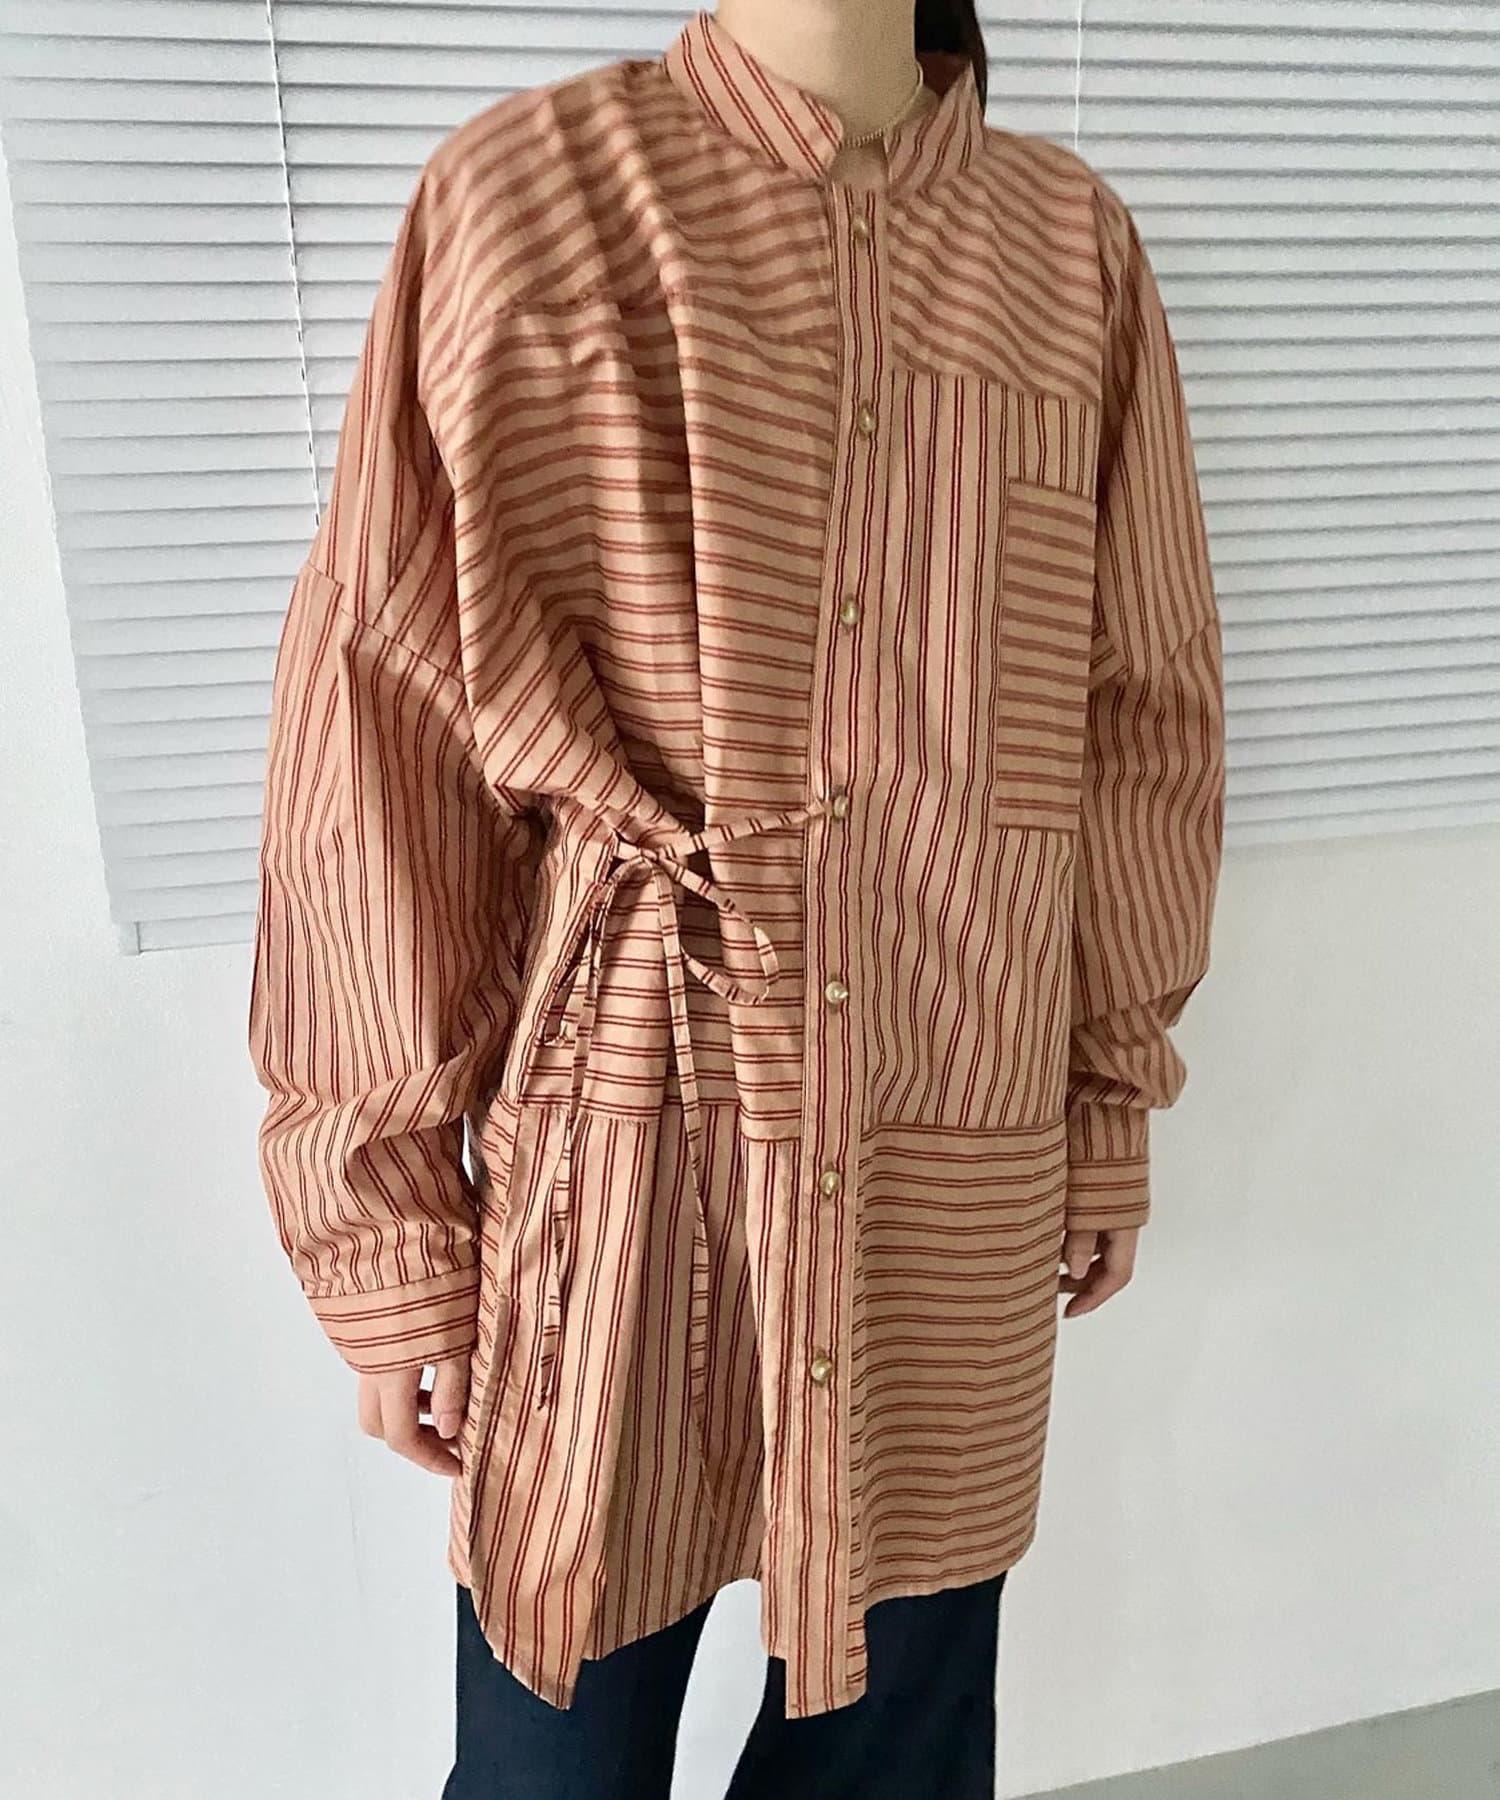 Kastane(カスタネ) パッチワークストライプアレンジシャツ